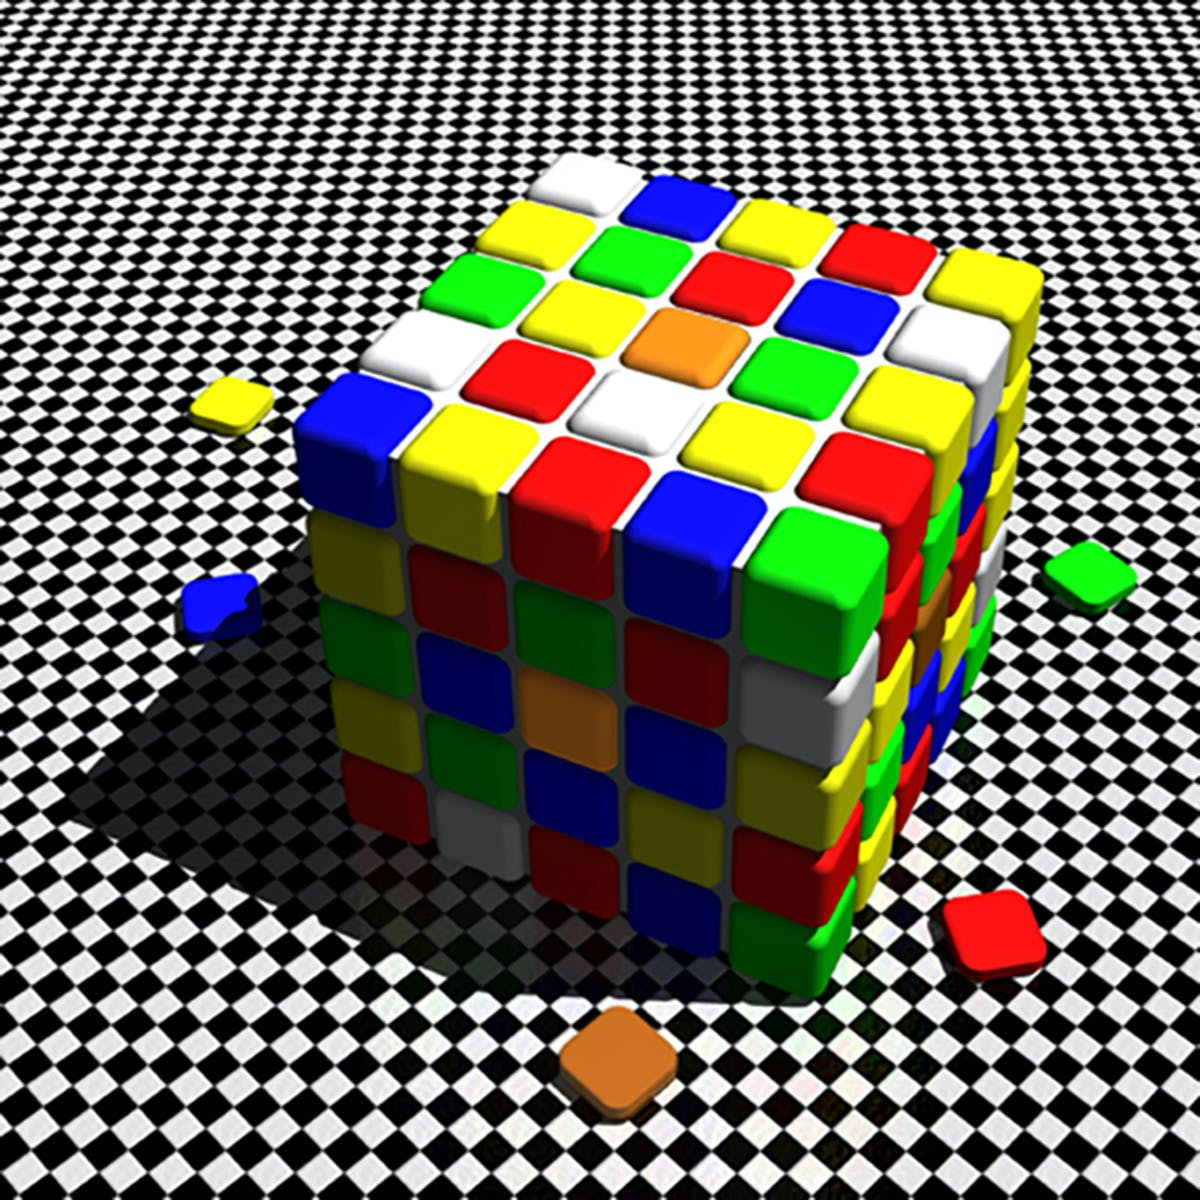 Visual Perception and the Brain